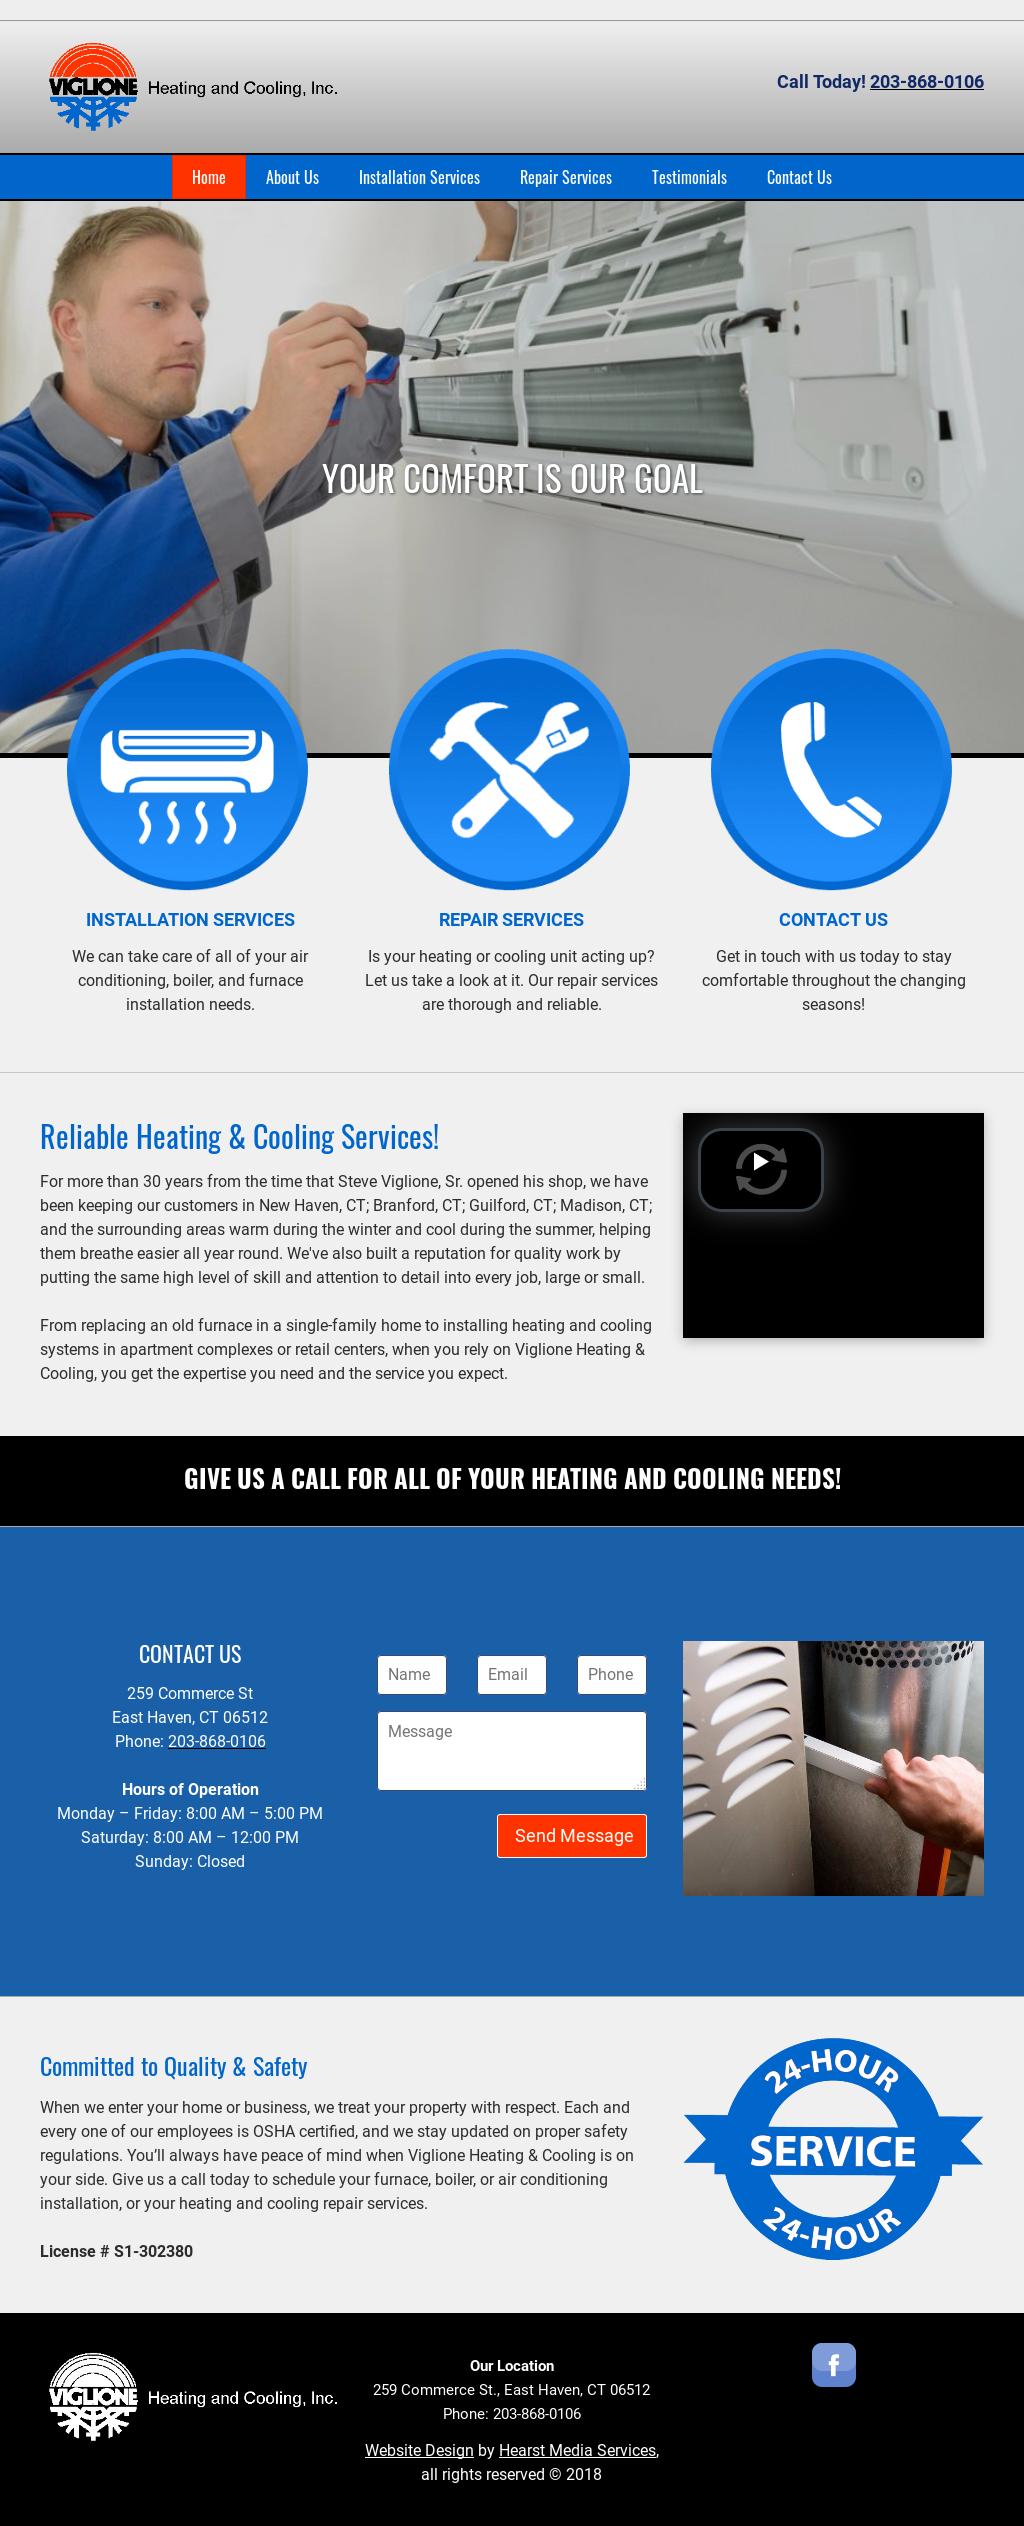 Viglione Heating Cooling S Website Screenshot On